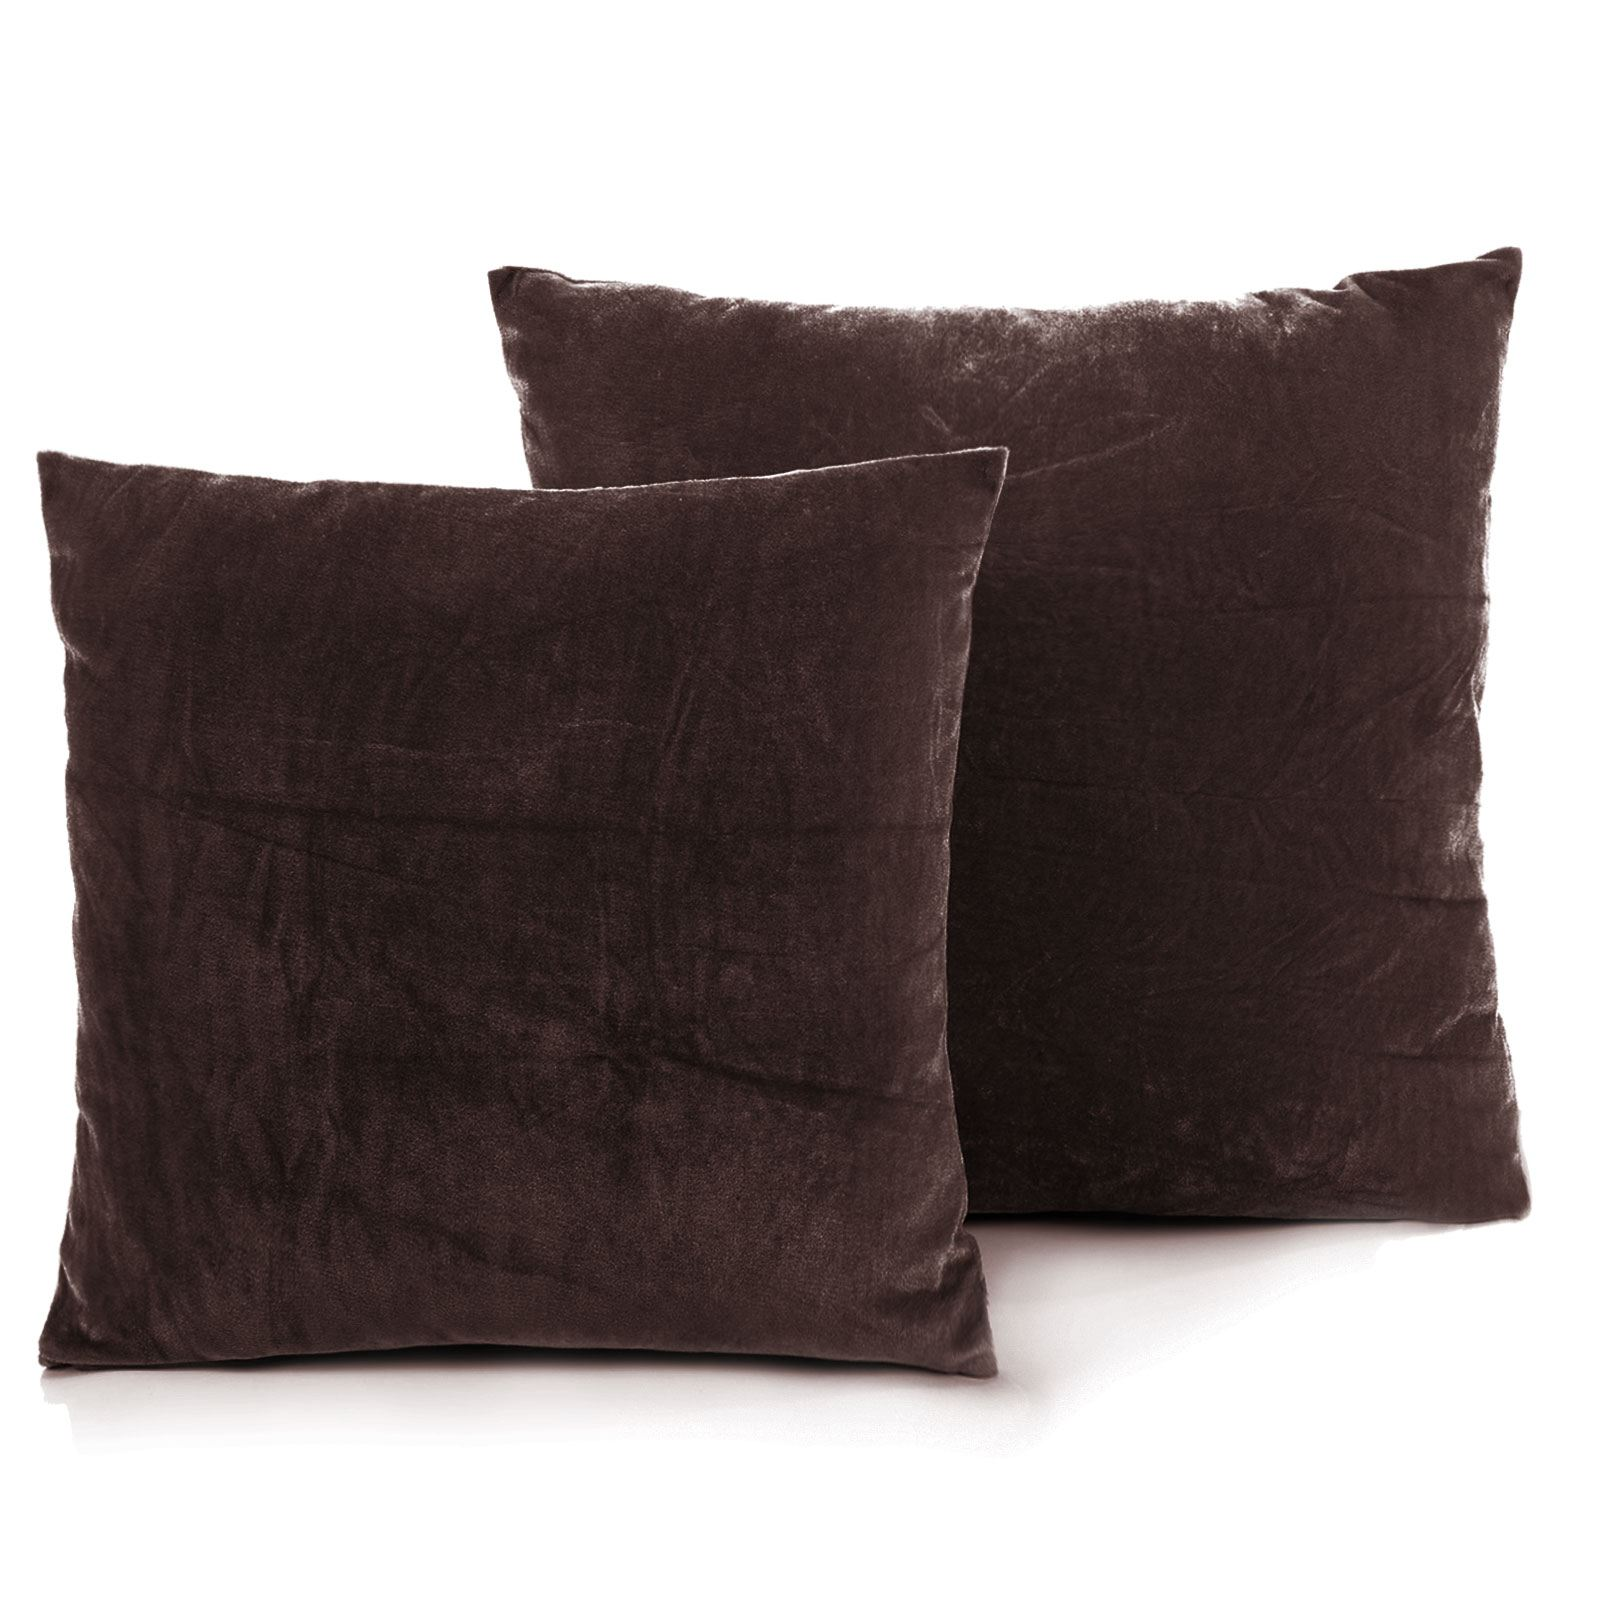 luxury faux fur cushion covers pads sofa pillow cases bed decoration 45 x 45 cm. Black Bedroom Furniture Sets. Home Design Ideas